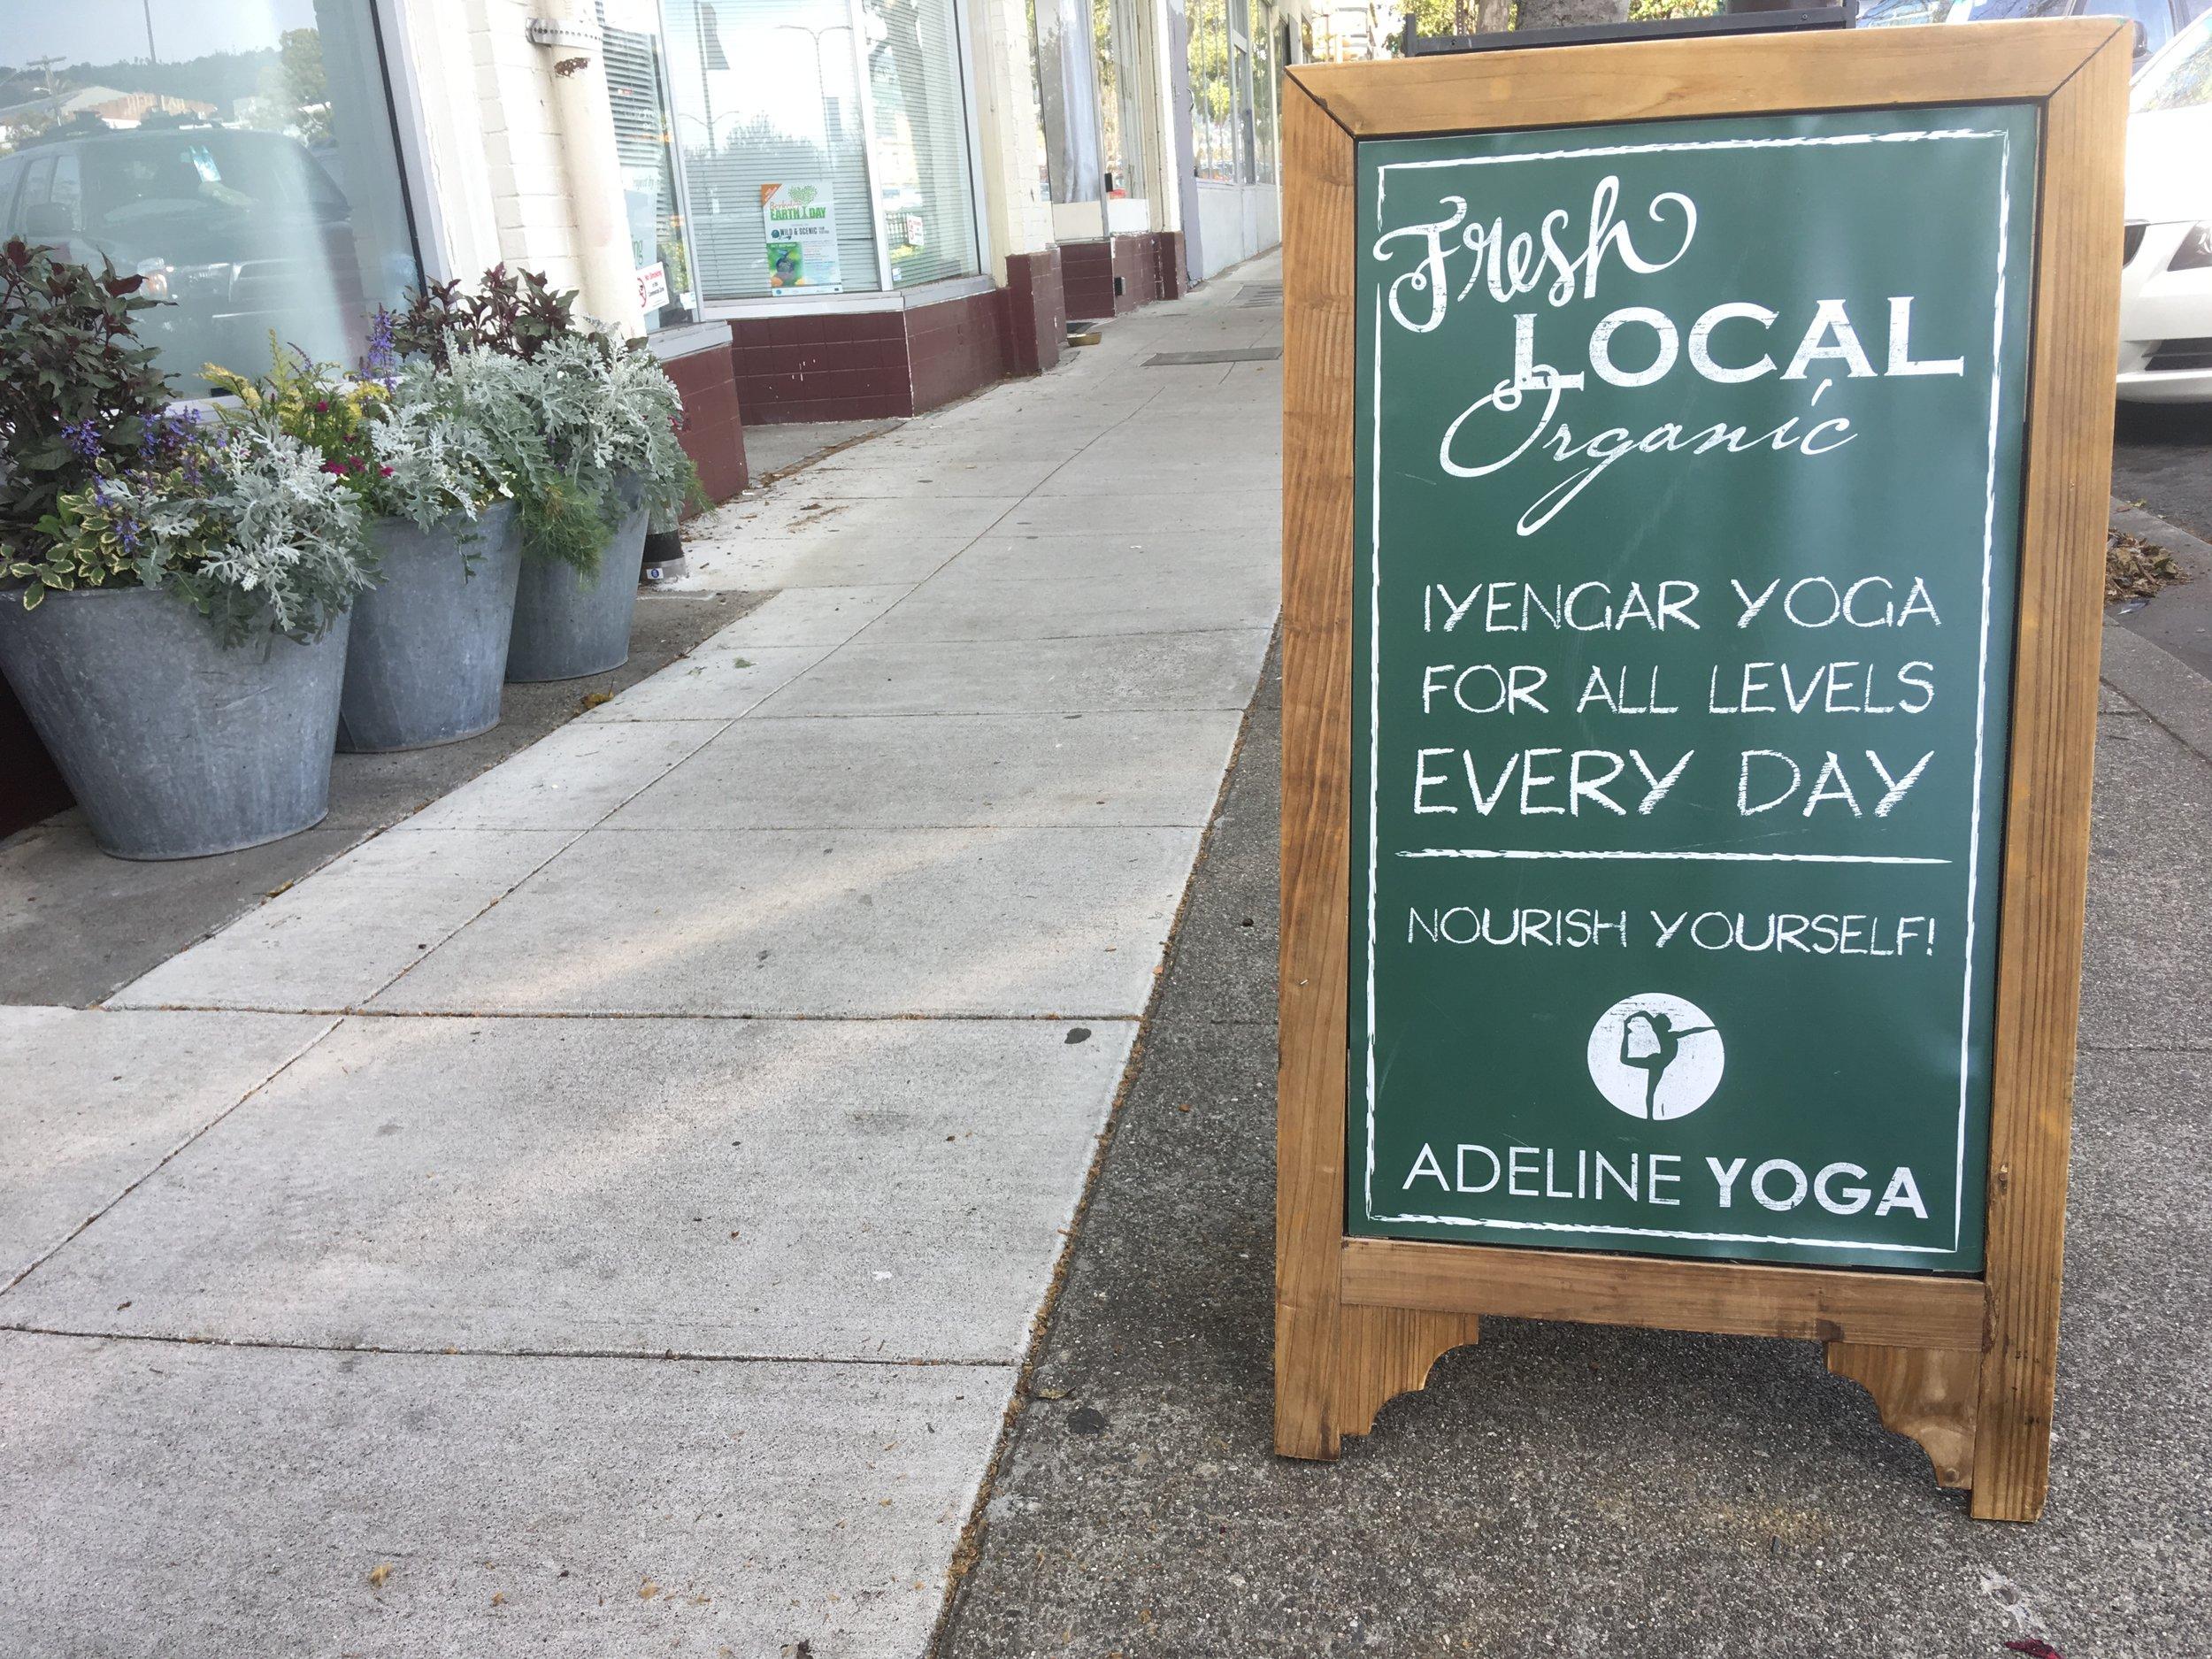 fresh_local_organic_Iyengar_yoga.JPG